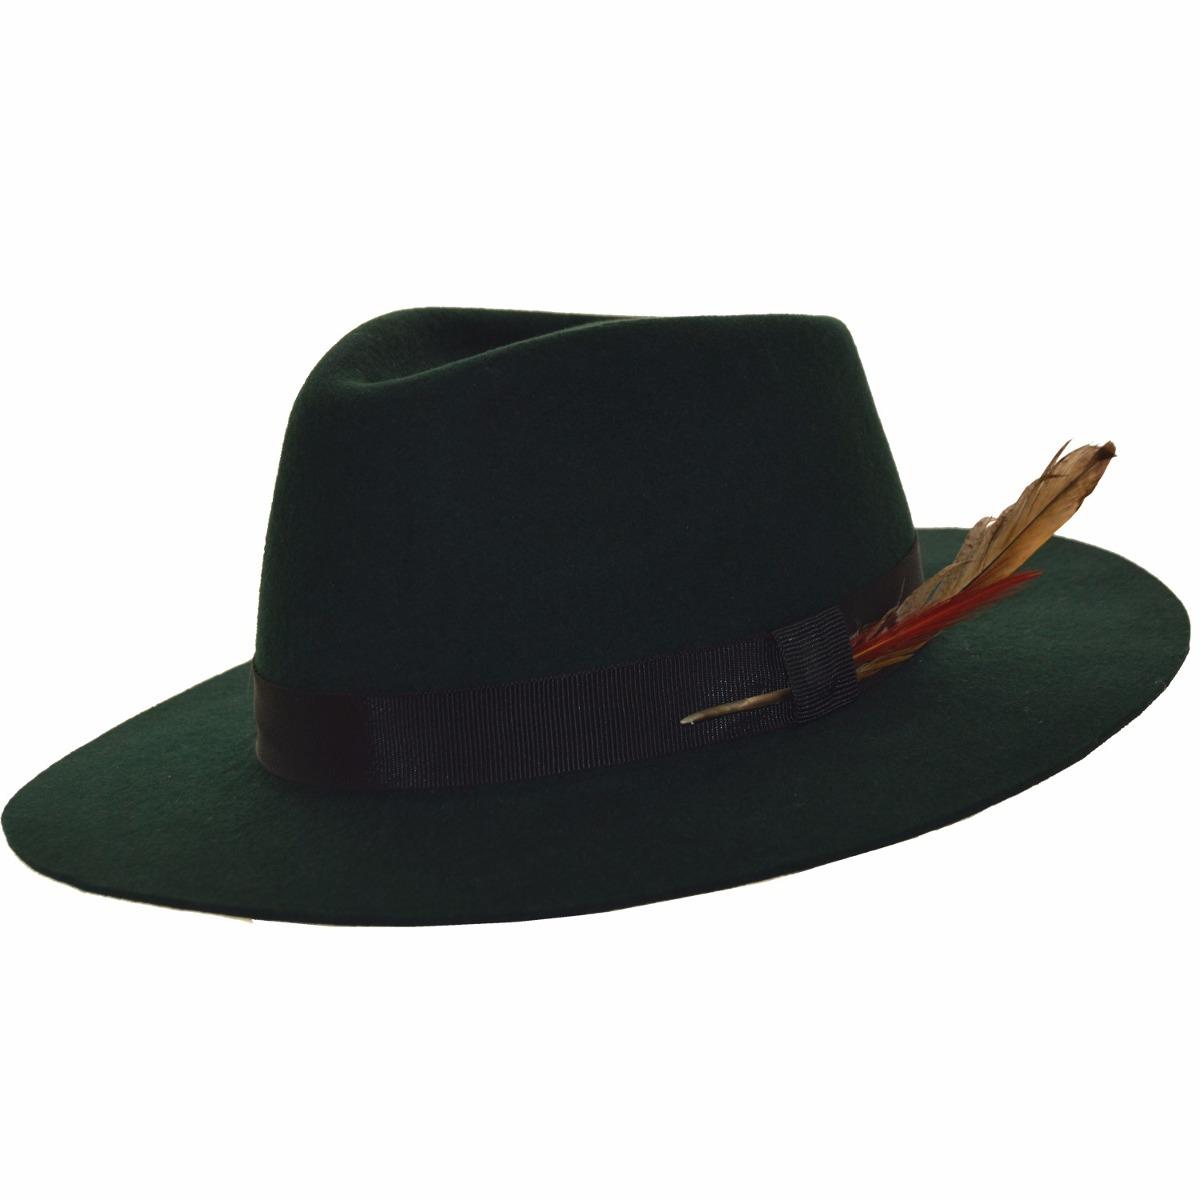 7893815269a1b Sombrero Australiano Fieltro Compañia De Sombreros M61408804 ...